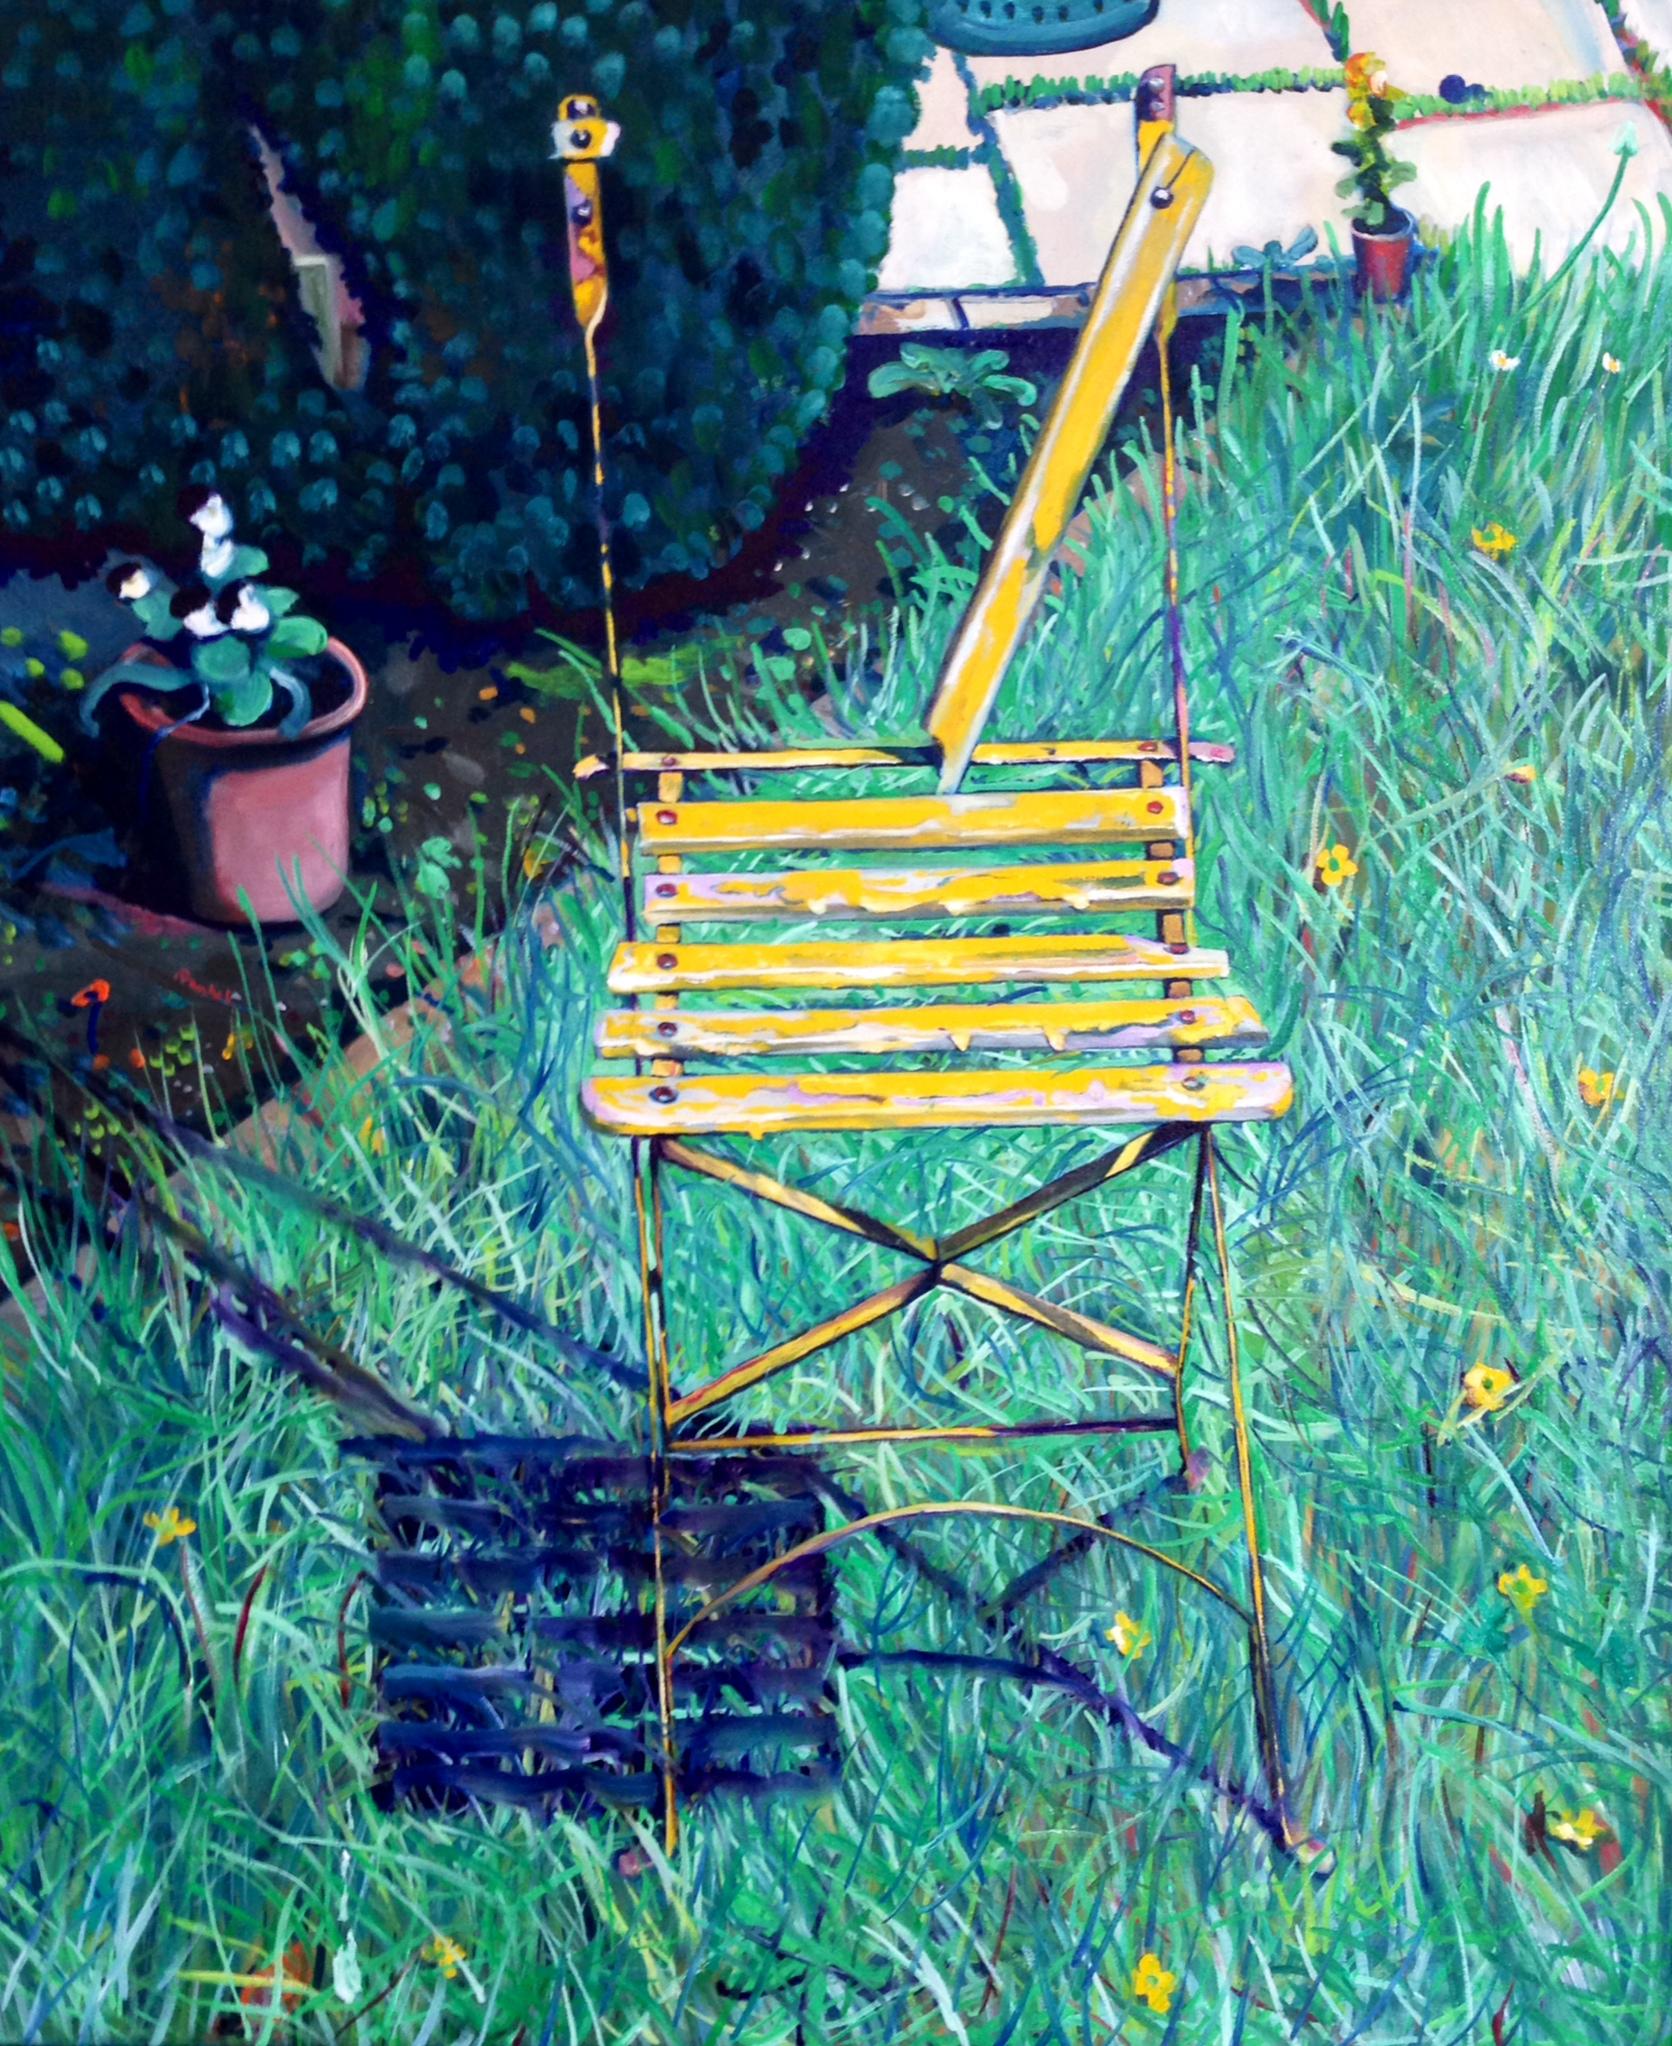 Chair by Conrad Frankel